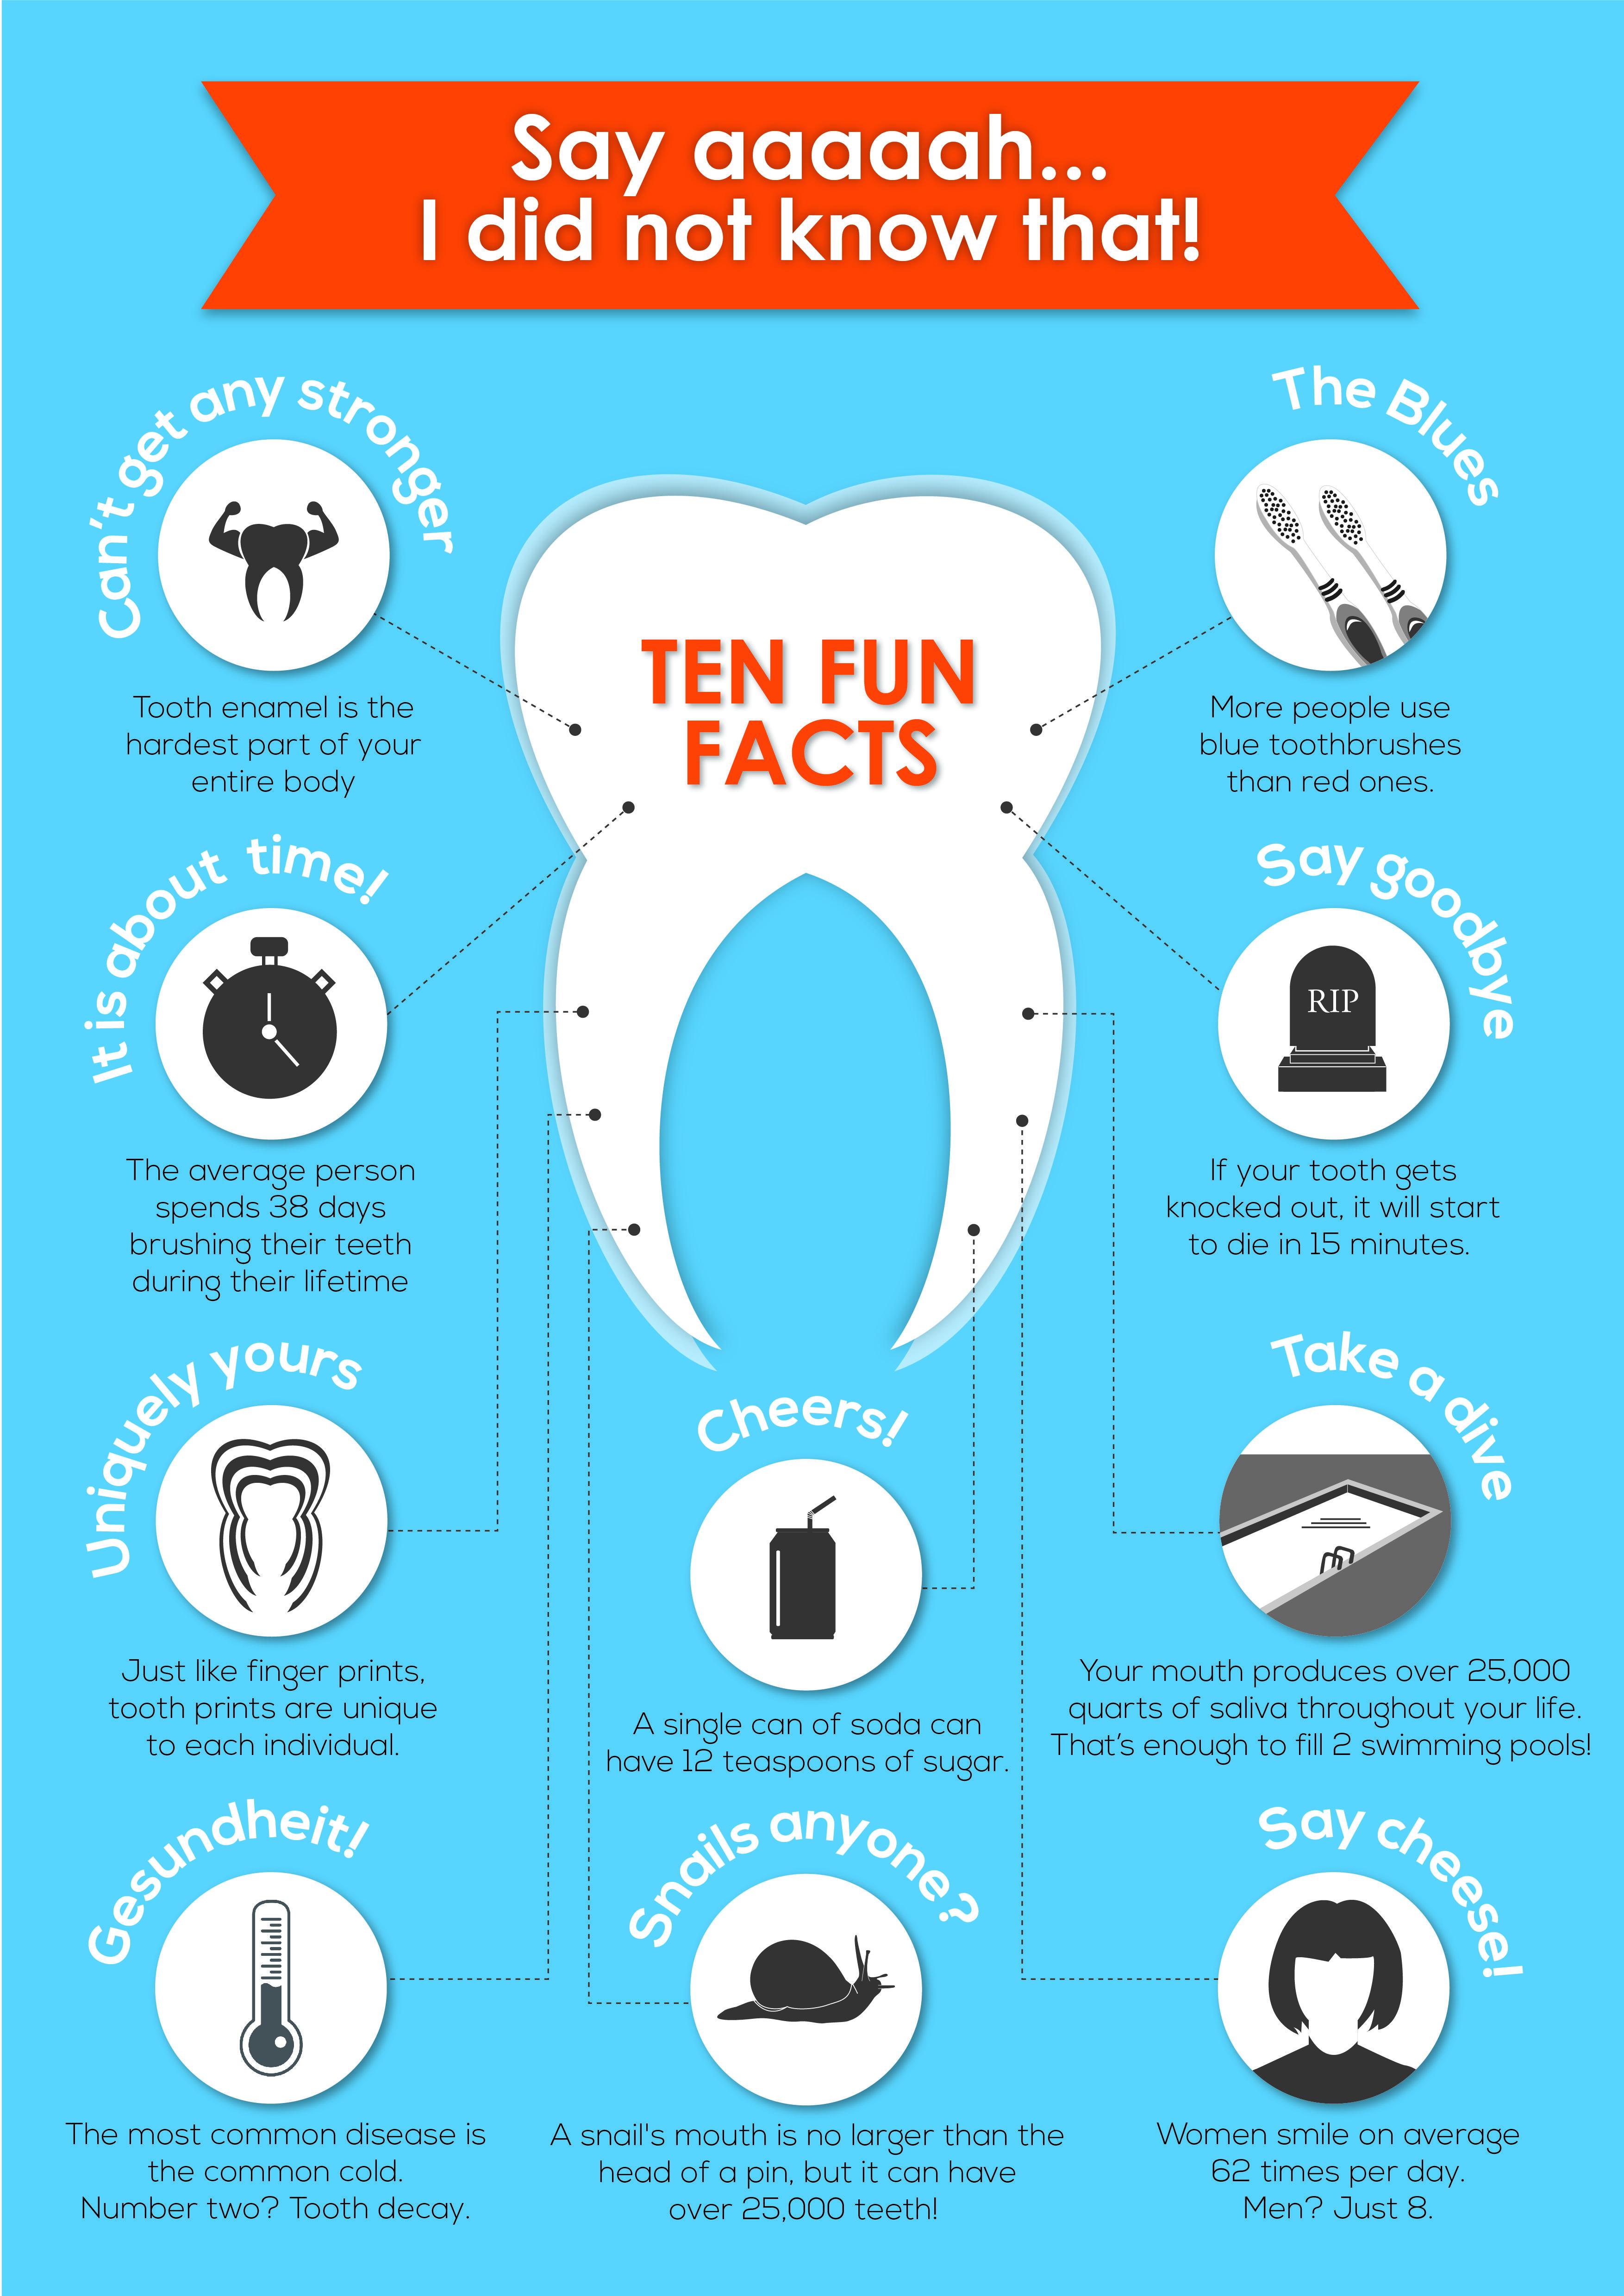 teeth tips from Encore Dental dentists